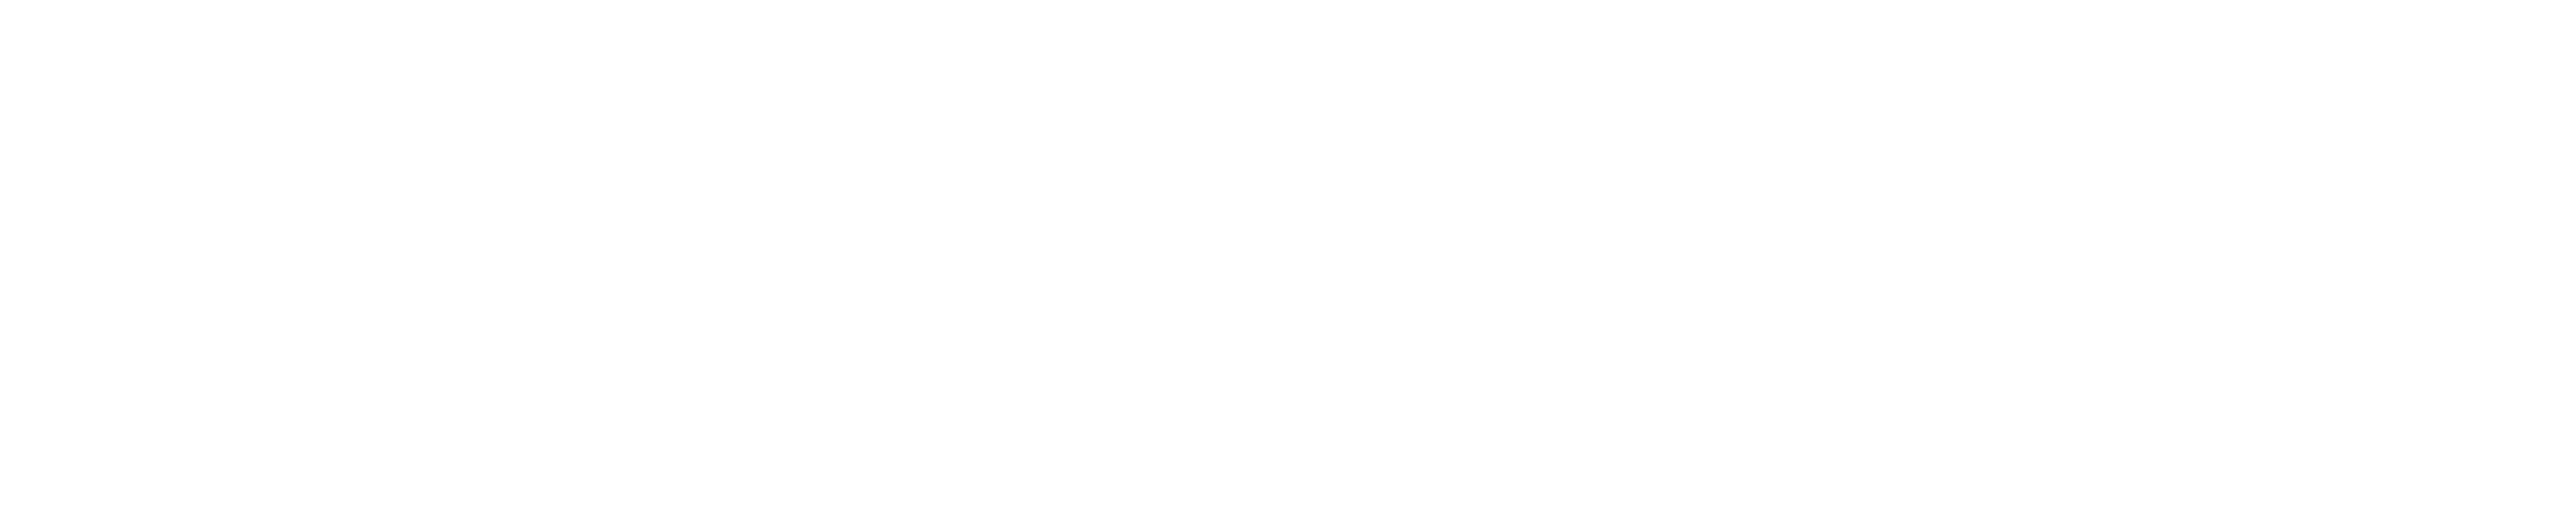 PPI IoT/Manufatura 4.0